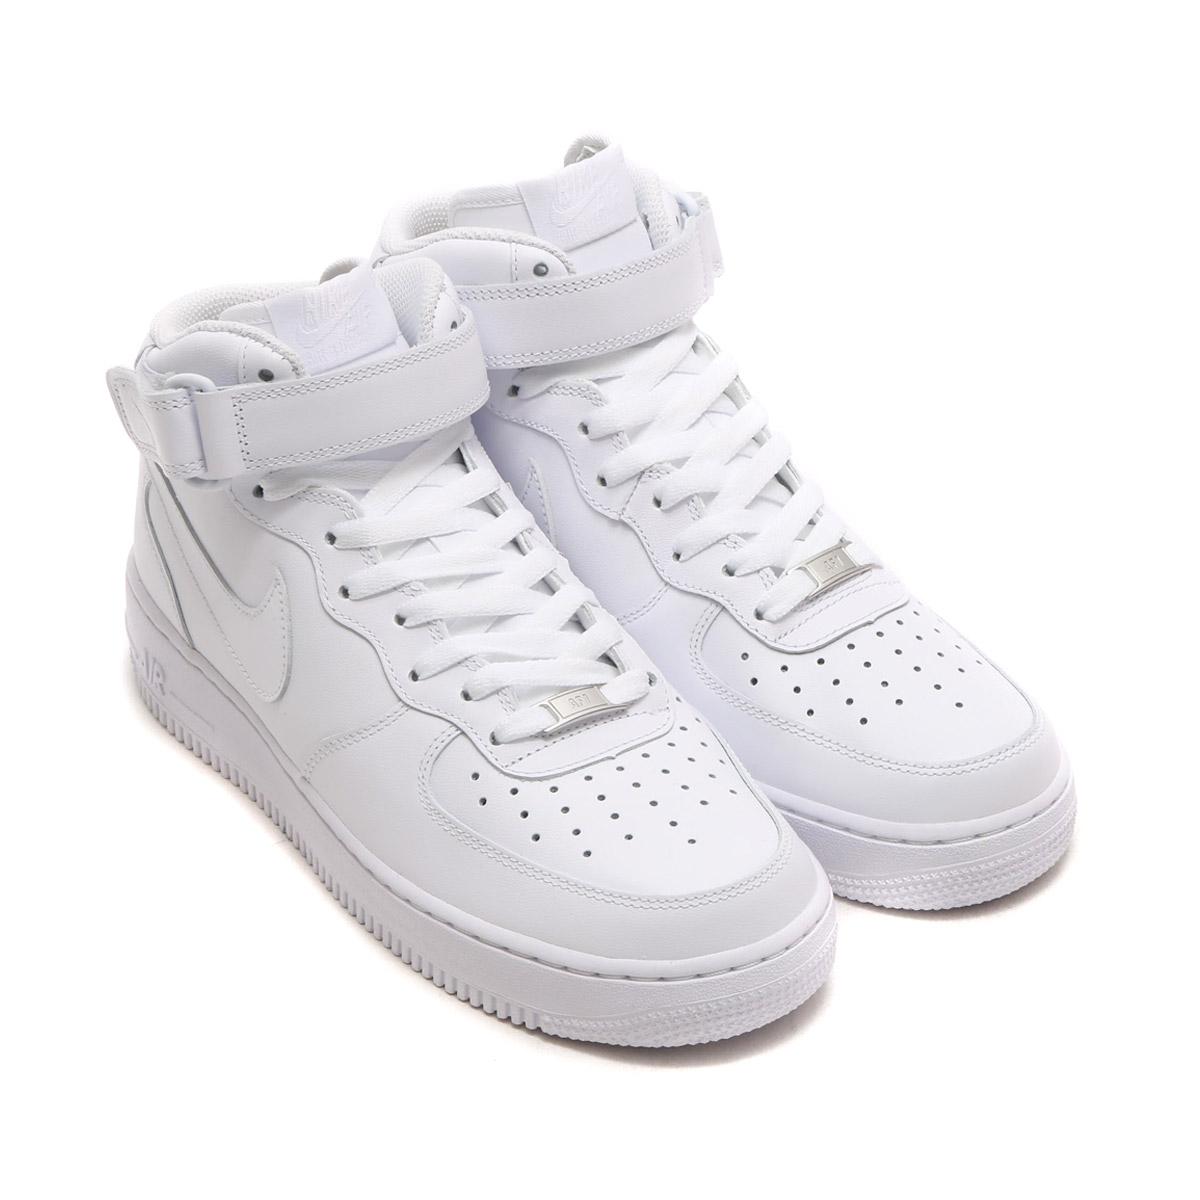 11e4b7f4eff5 NIKE AIR FORCE 1 MID  07 (Nike air force 1 mid  07) WHITE WHITE CRYOVR